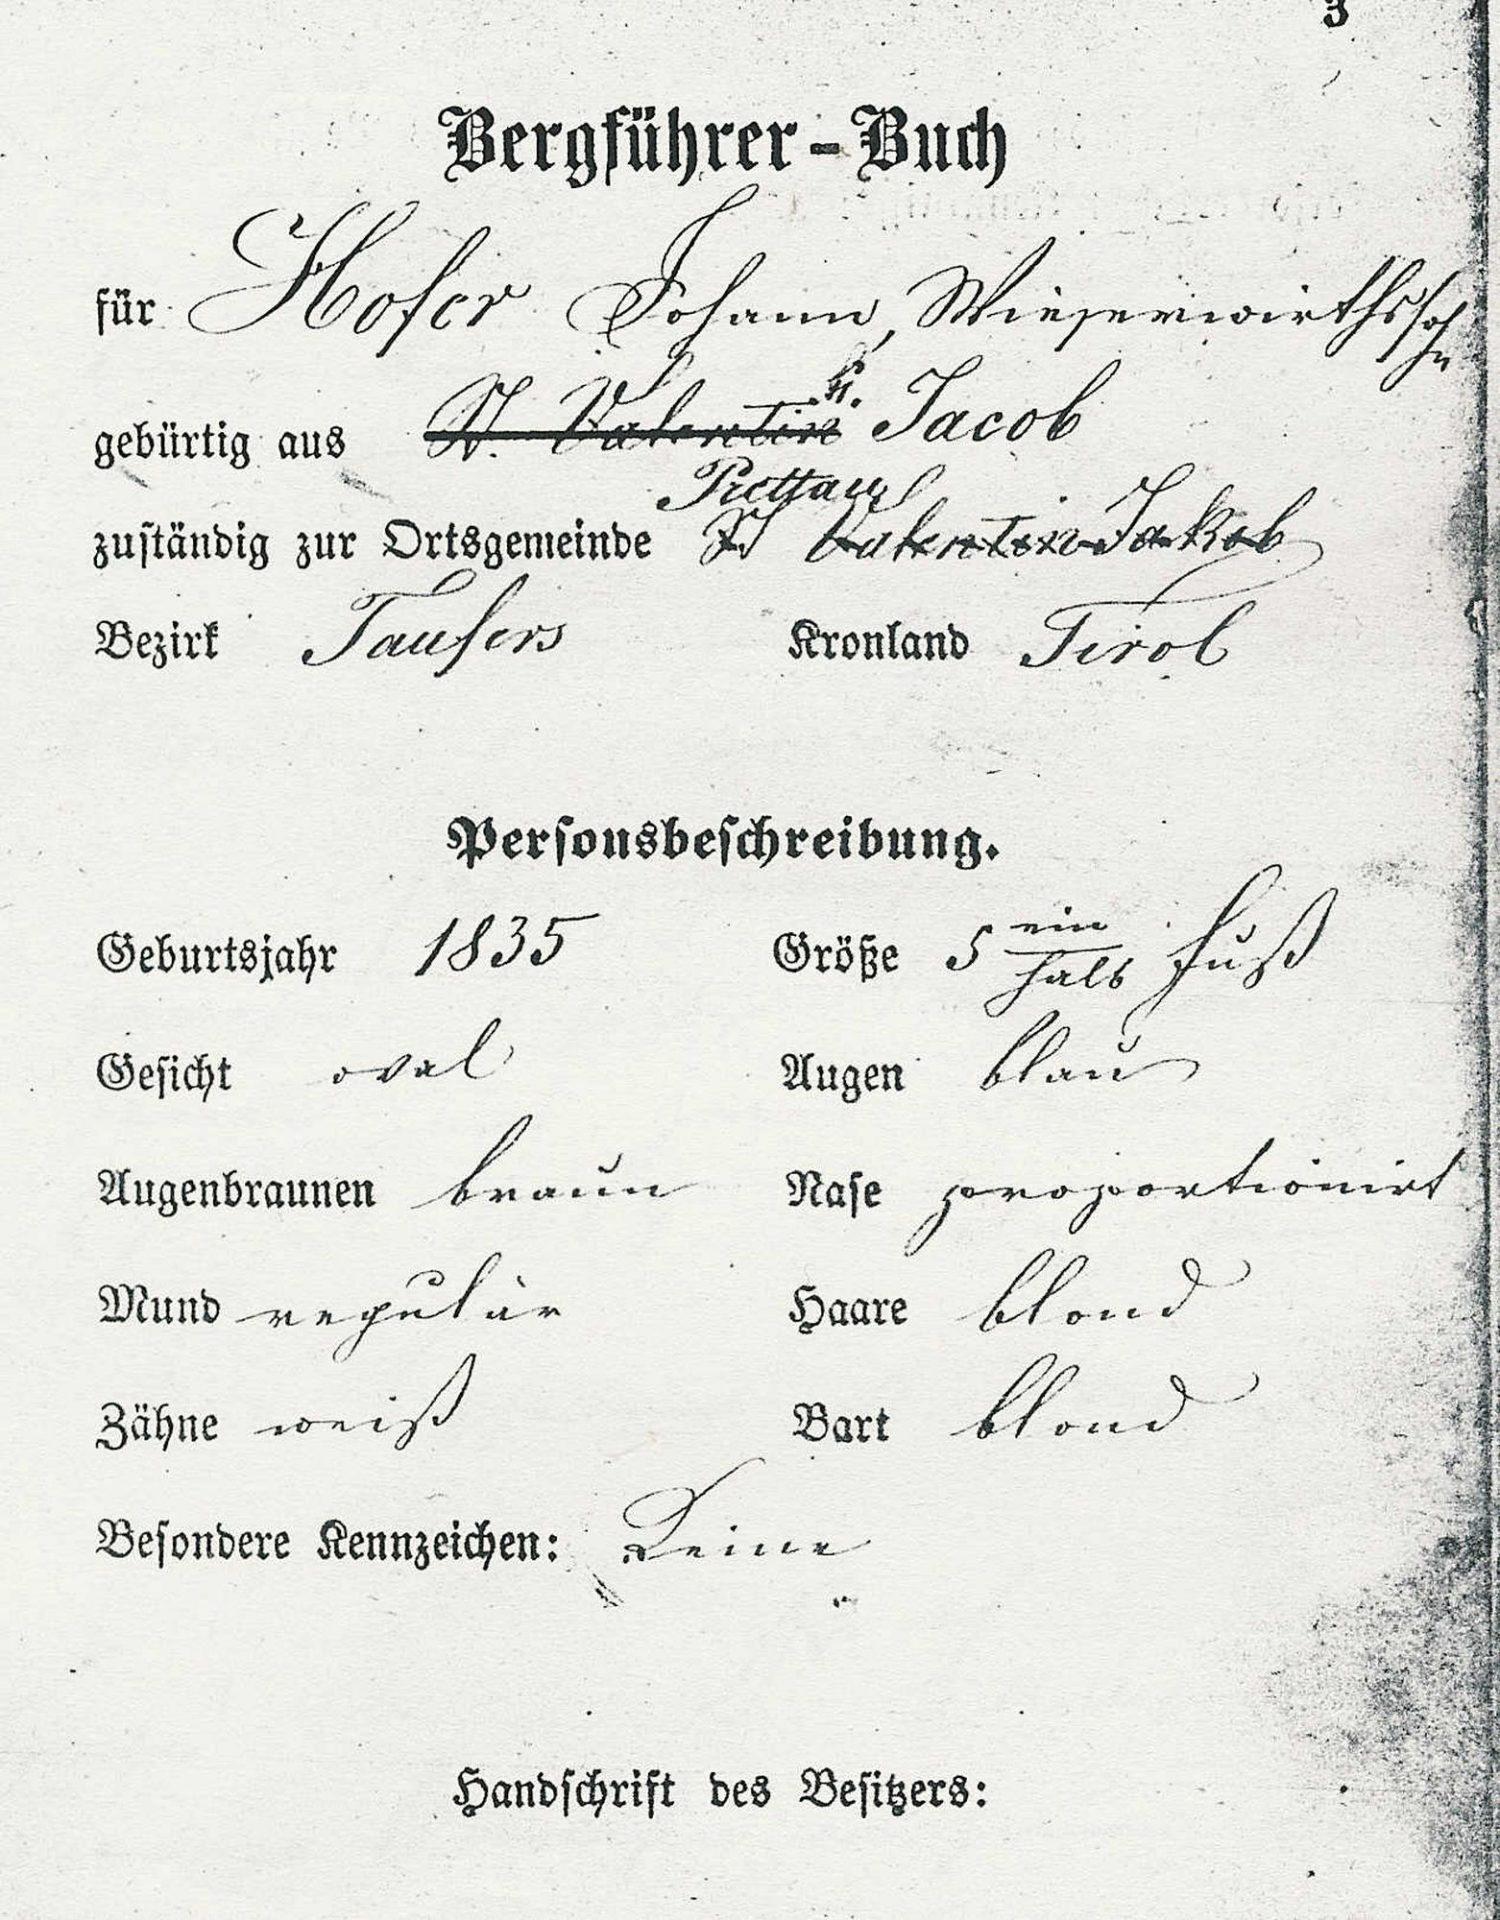 Bergführerbuch Johann Hofer I Berge erleben © Archiv Ingrid Beikircher